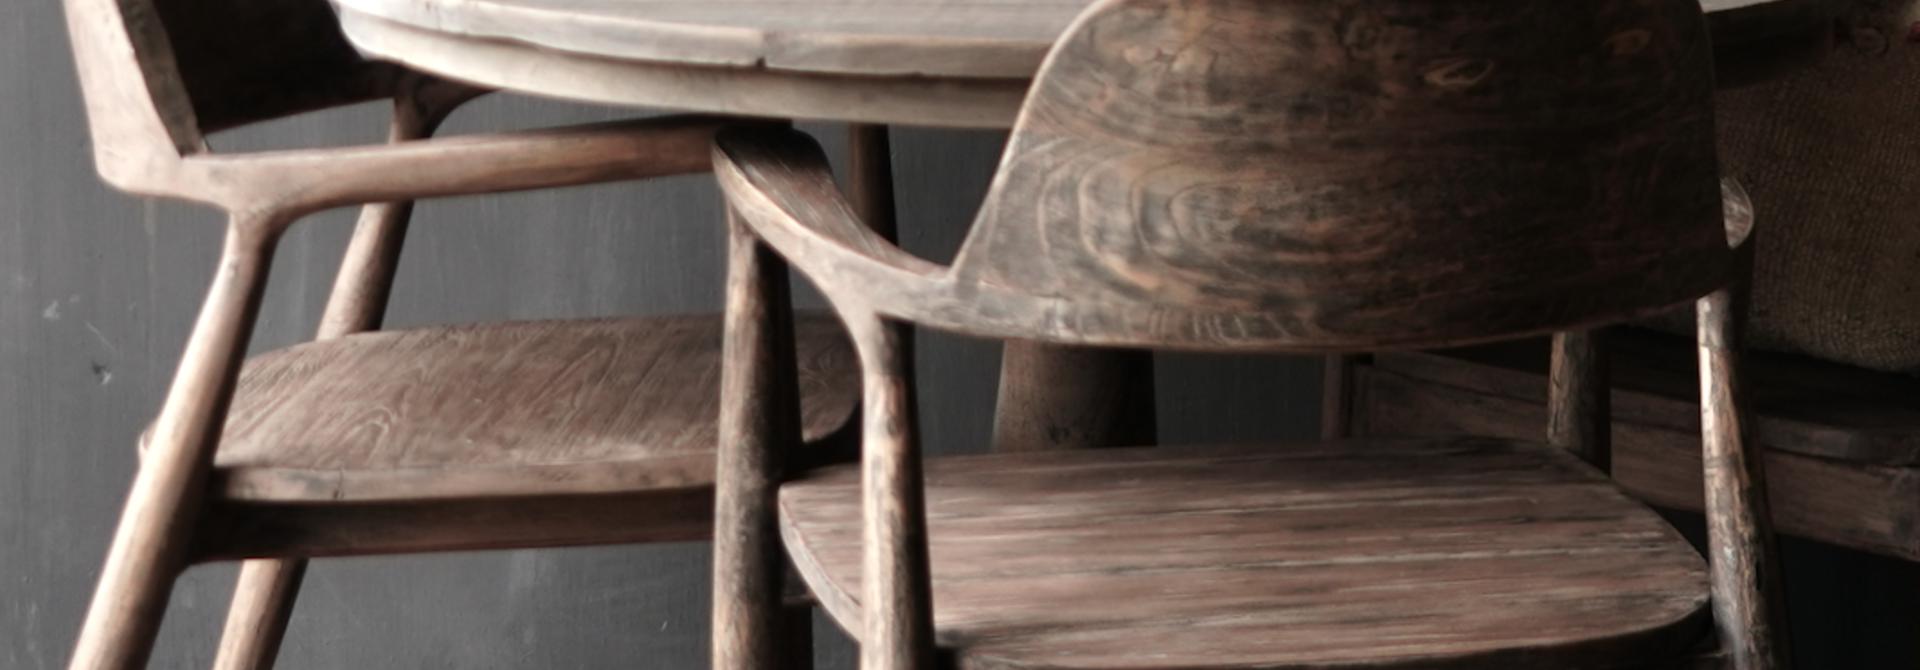 Alter alter Holzsessel aus Teakholz